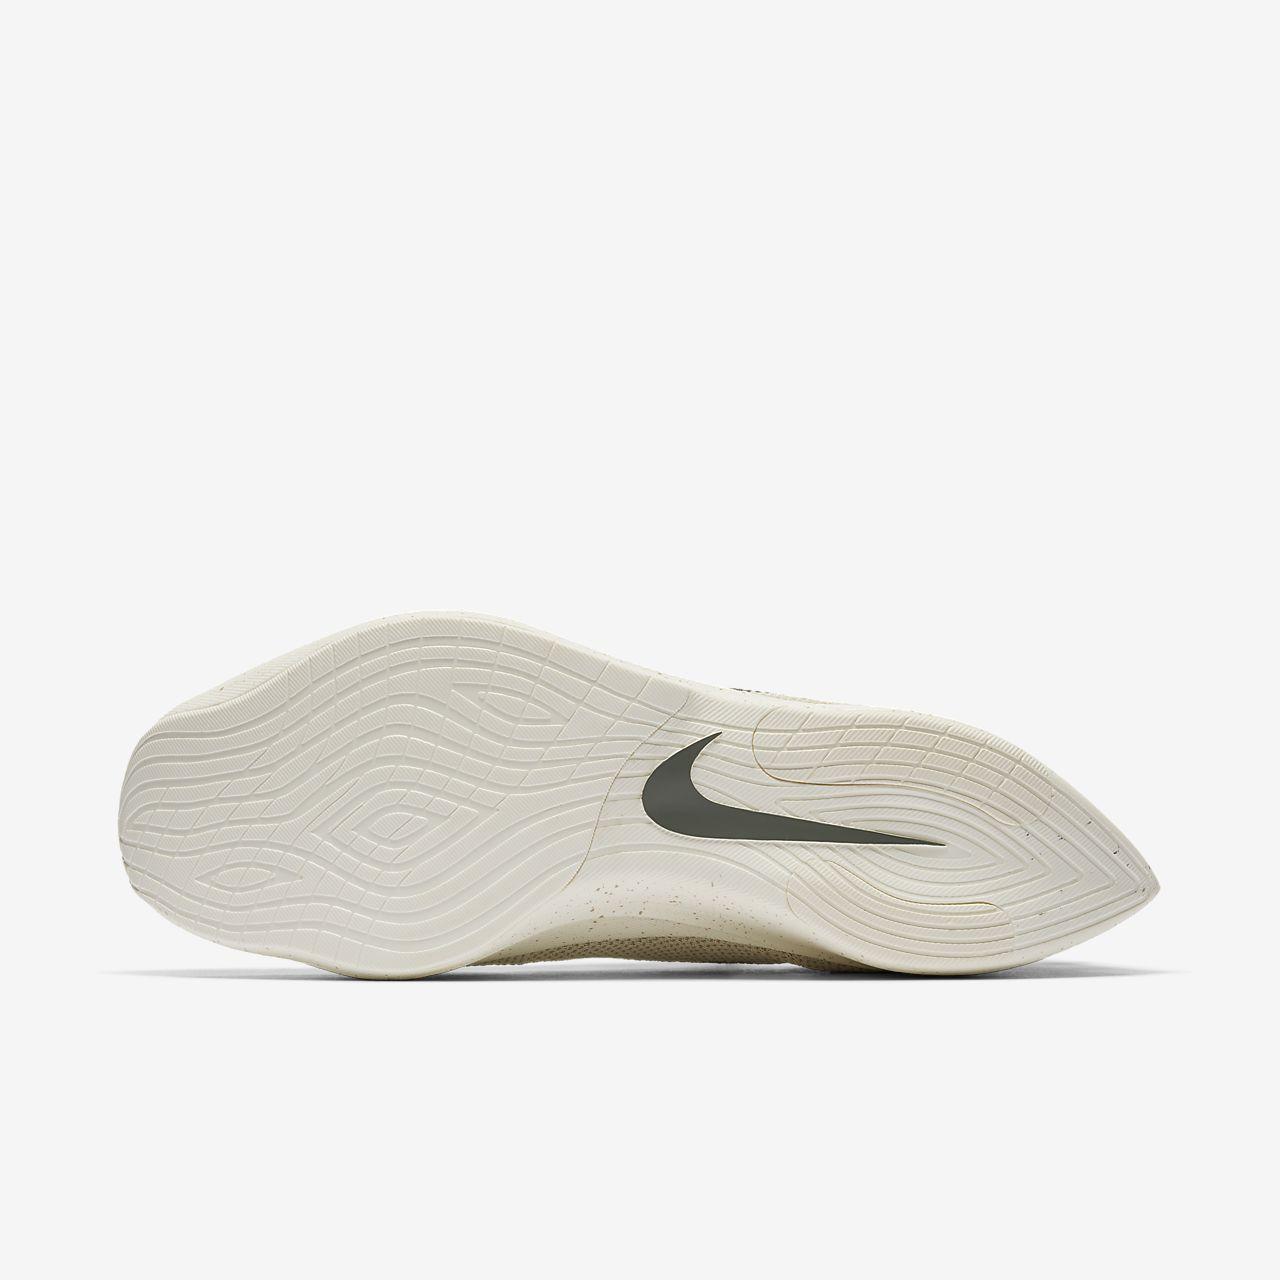 Nike Sko M React nSe Street F r Vapor Flyknit SMqUpGzV